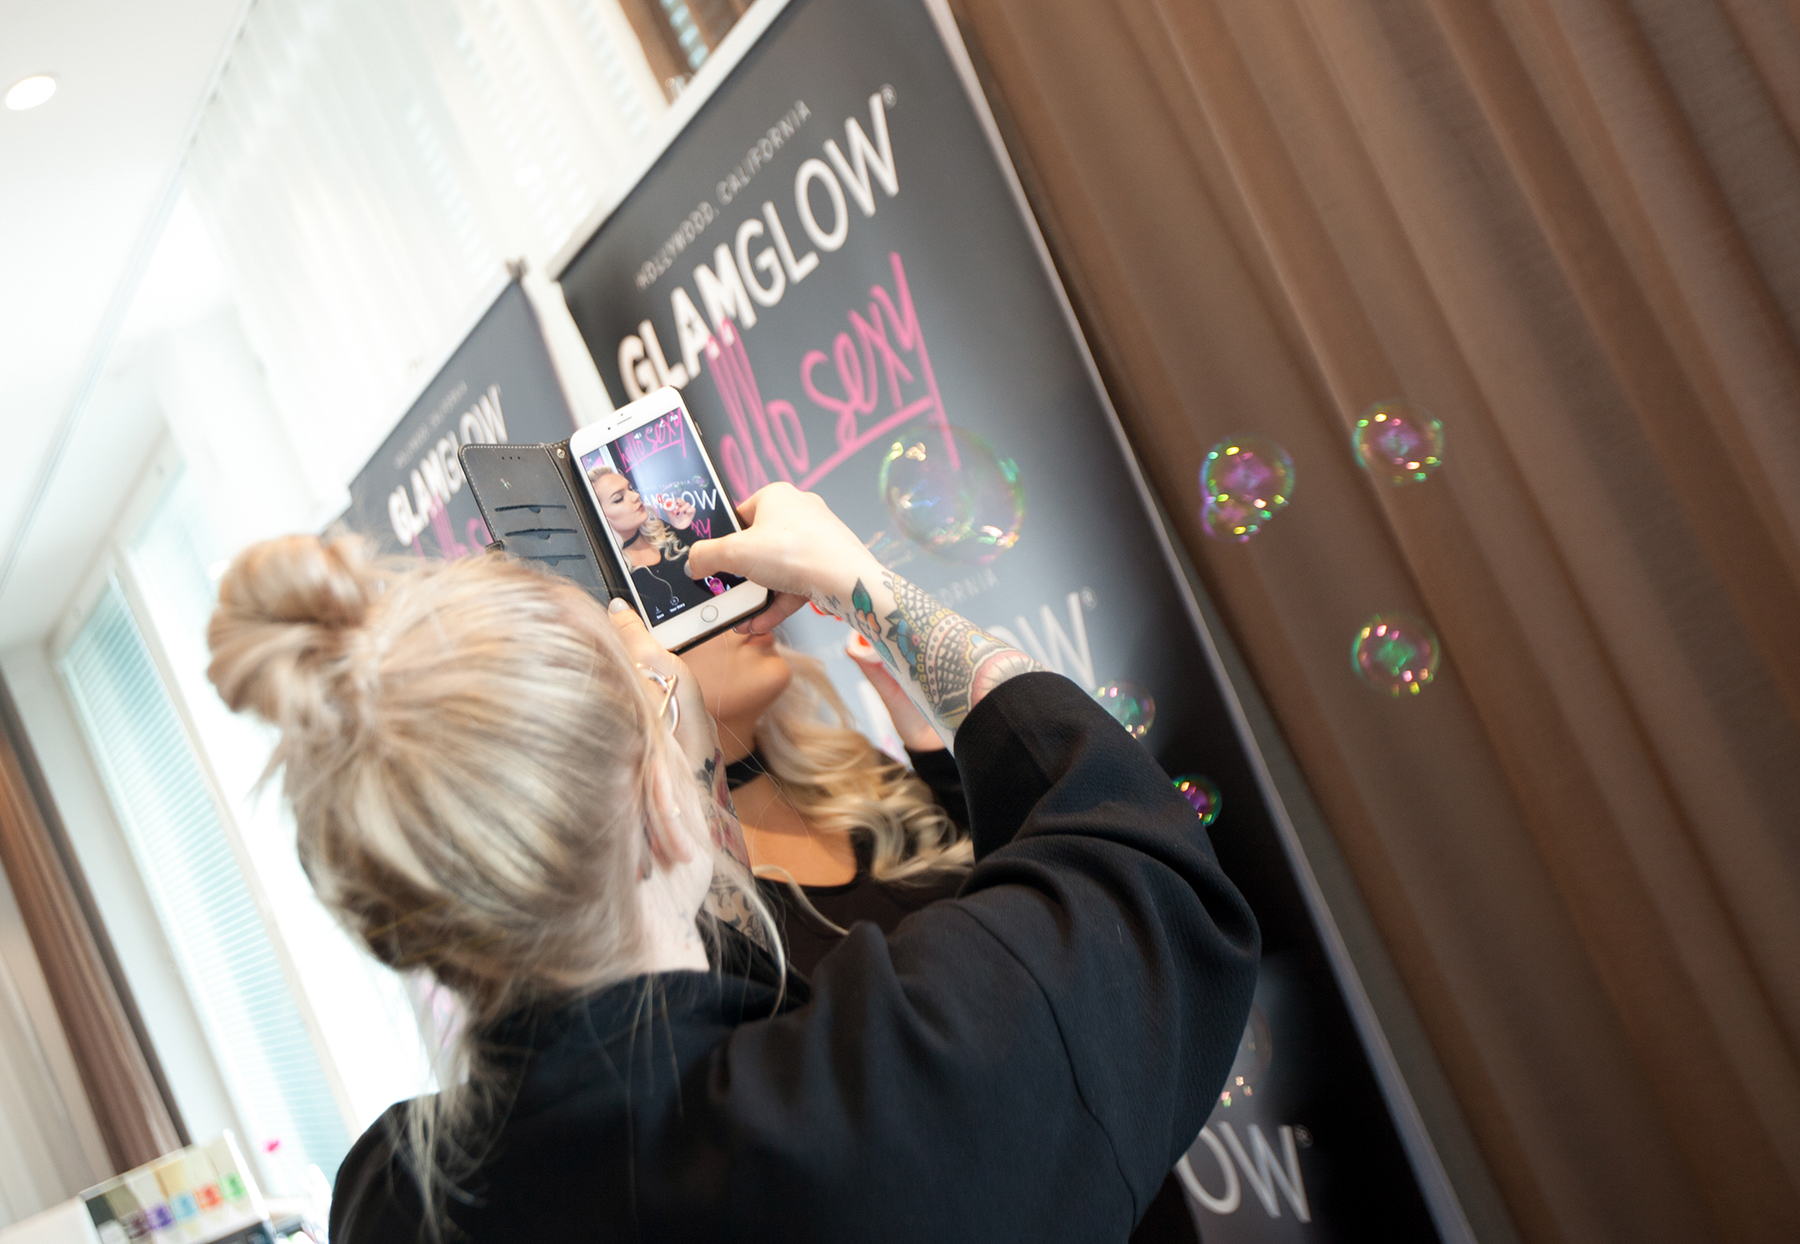 10 glamglow finland suomi 11.5.2017 emilia nummelin jenni janas successstory pr